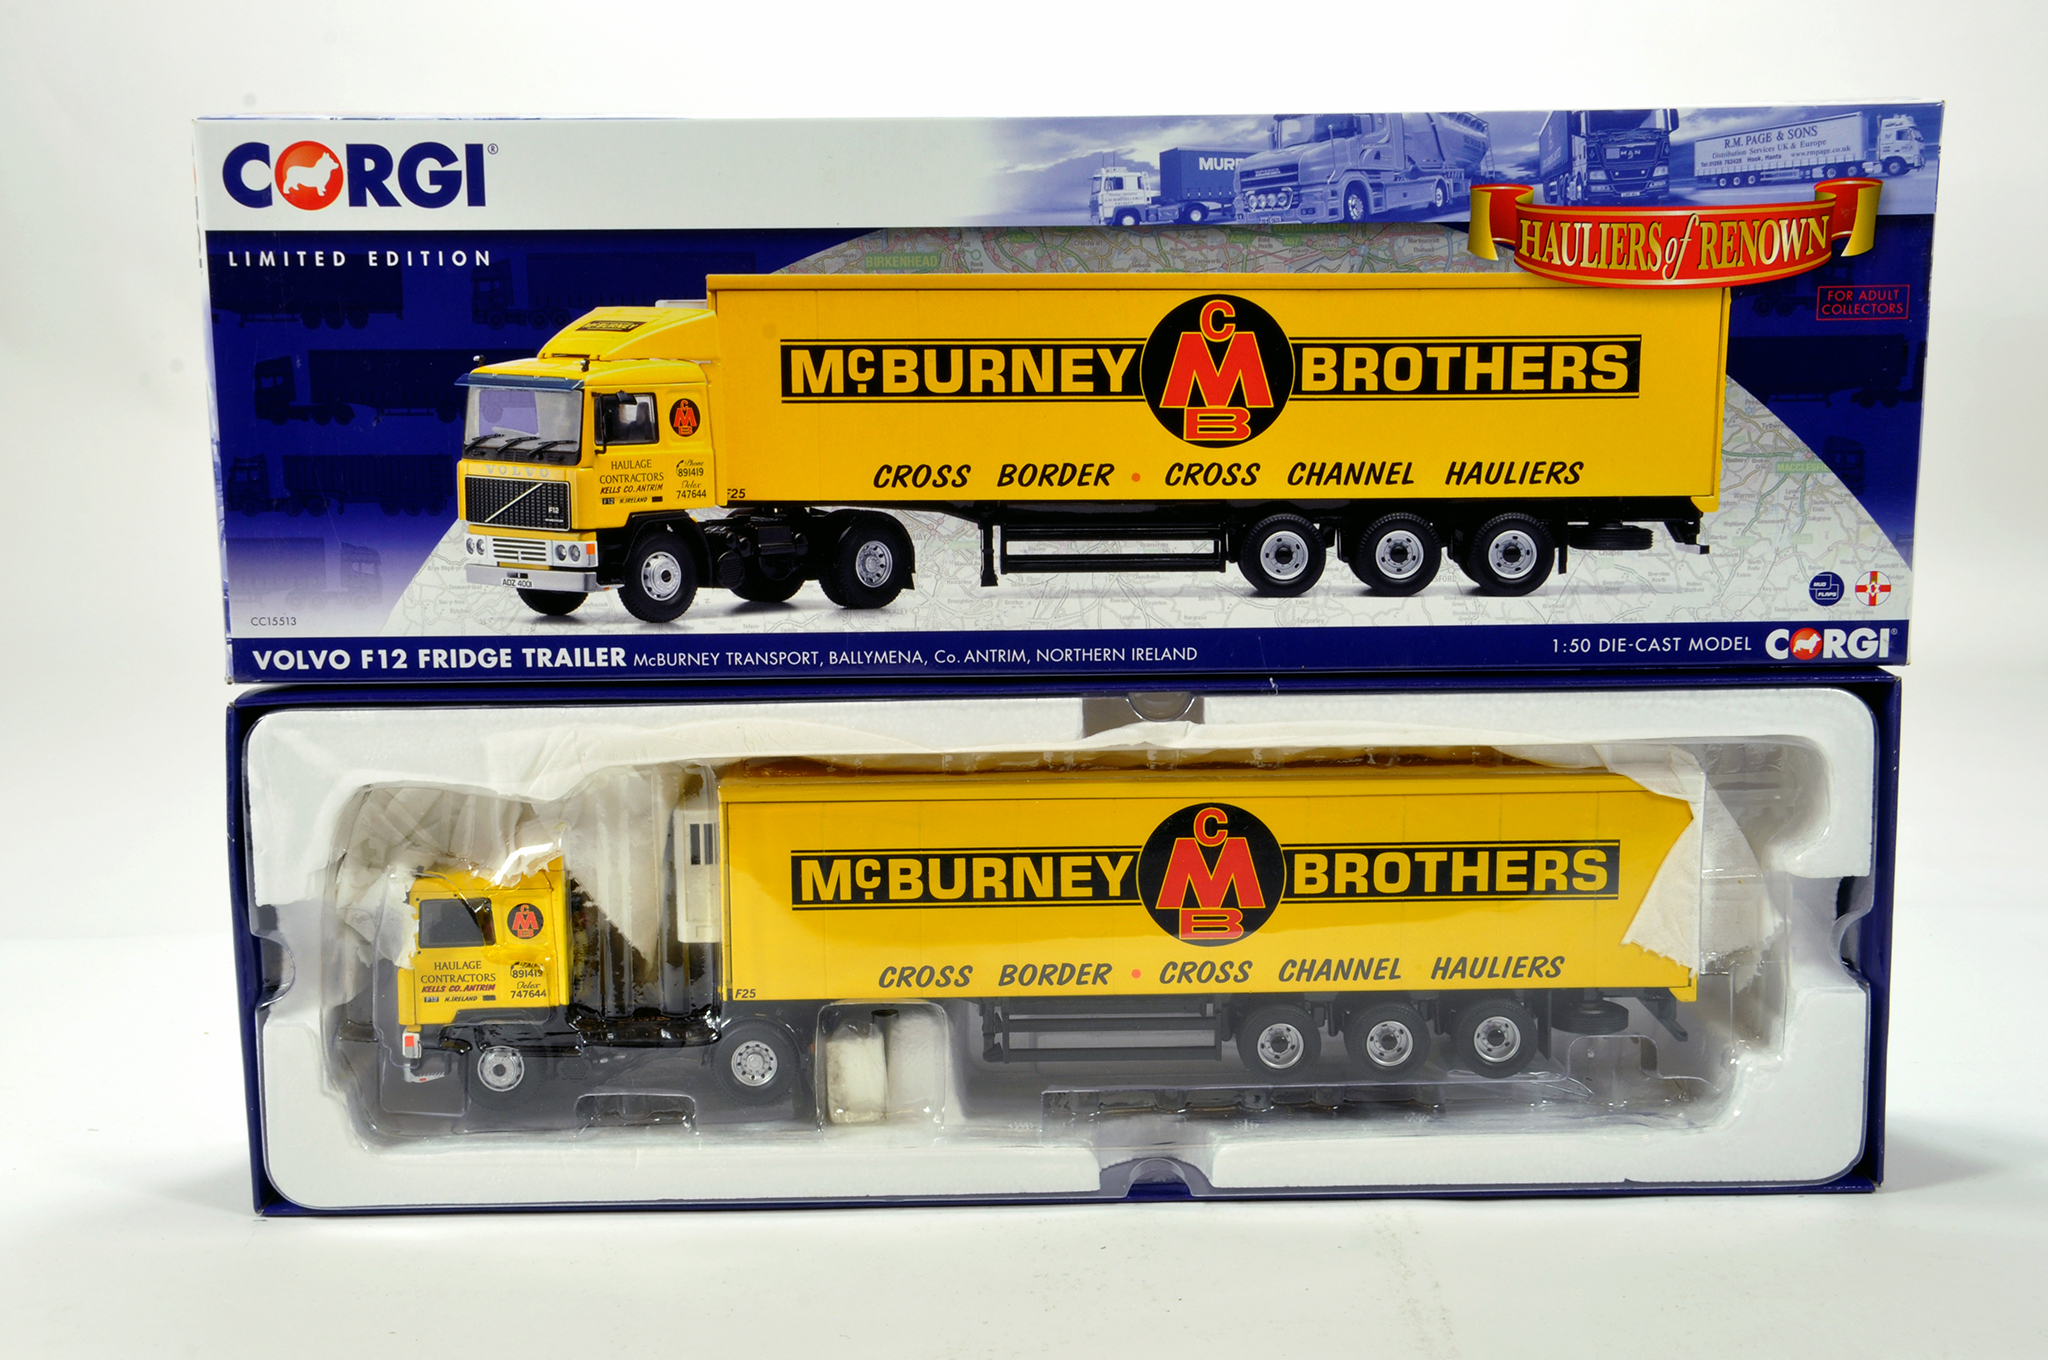 Lot 45 - Corgi 1/50 diecast truck issue comprising No. CC15513 Volvo F12 Fridge Trailer in livery of